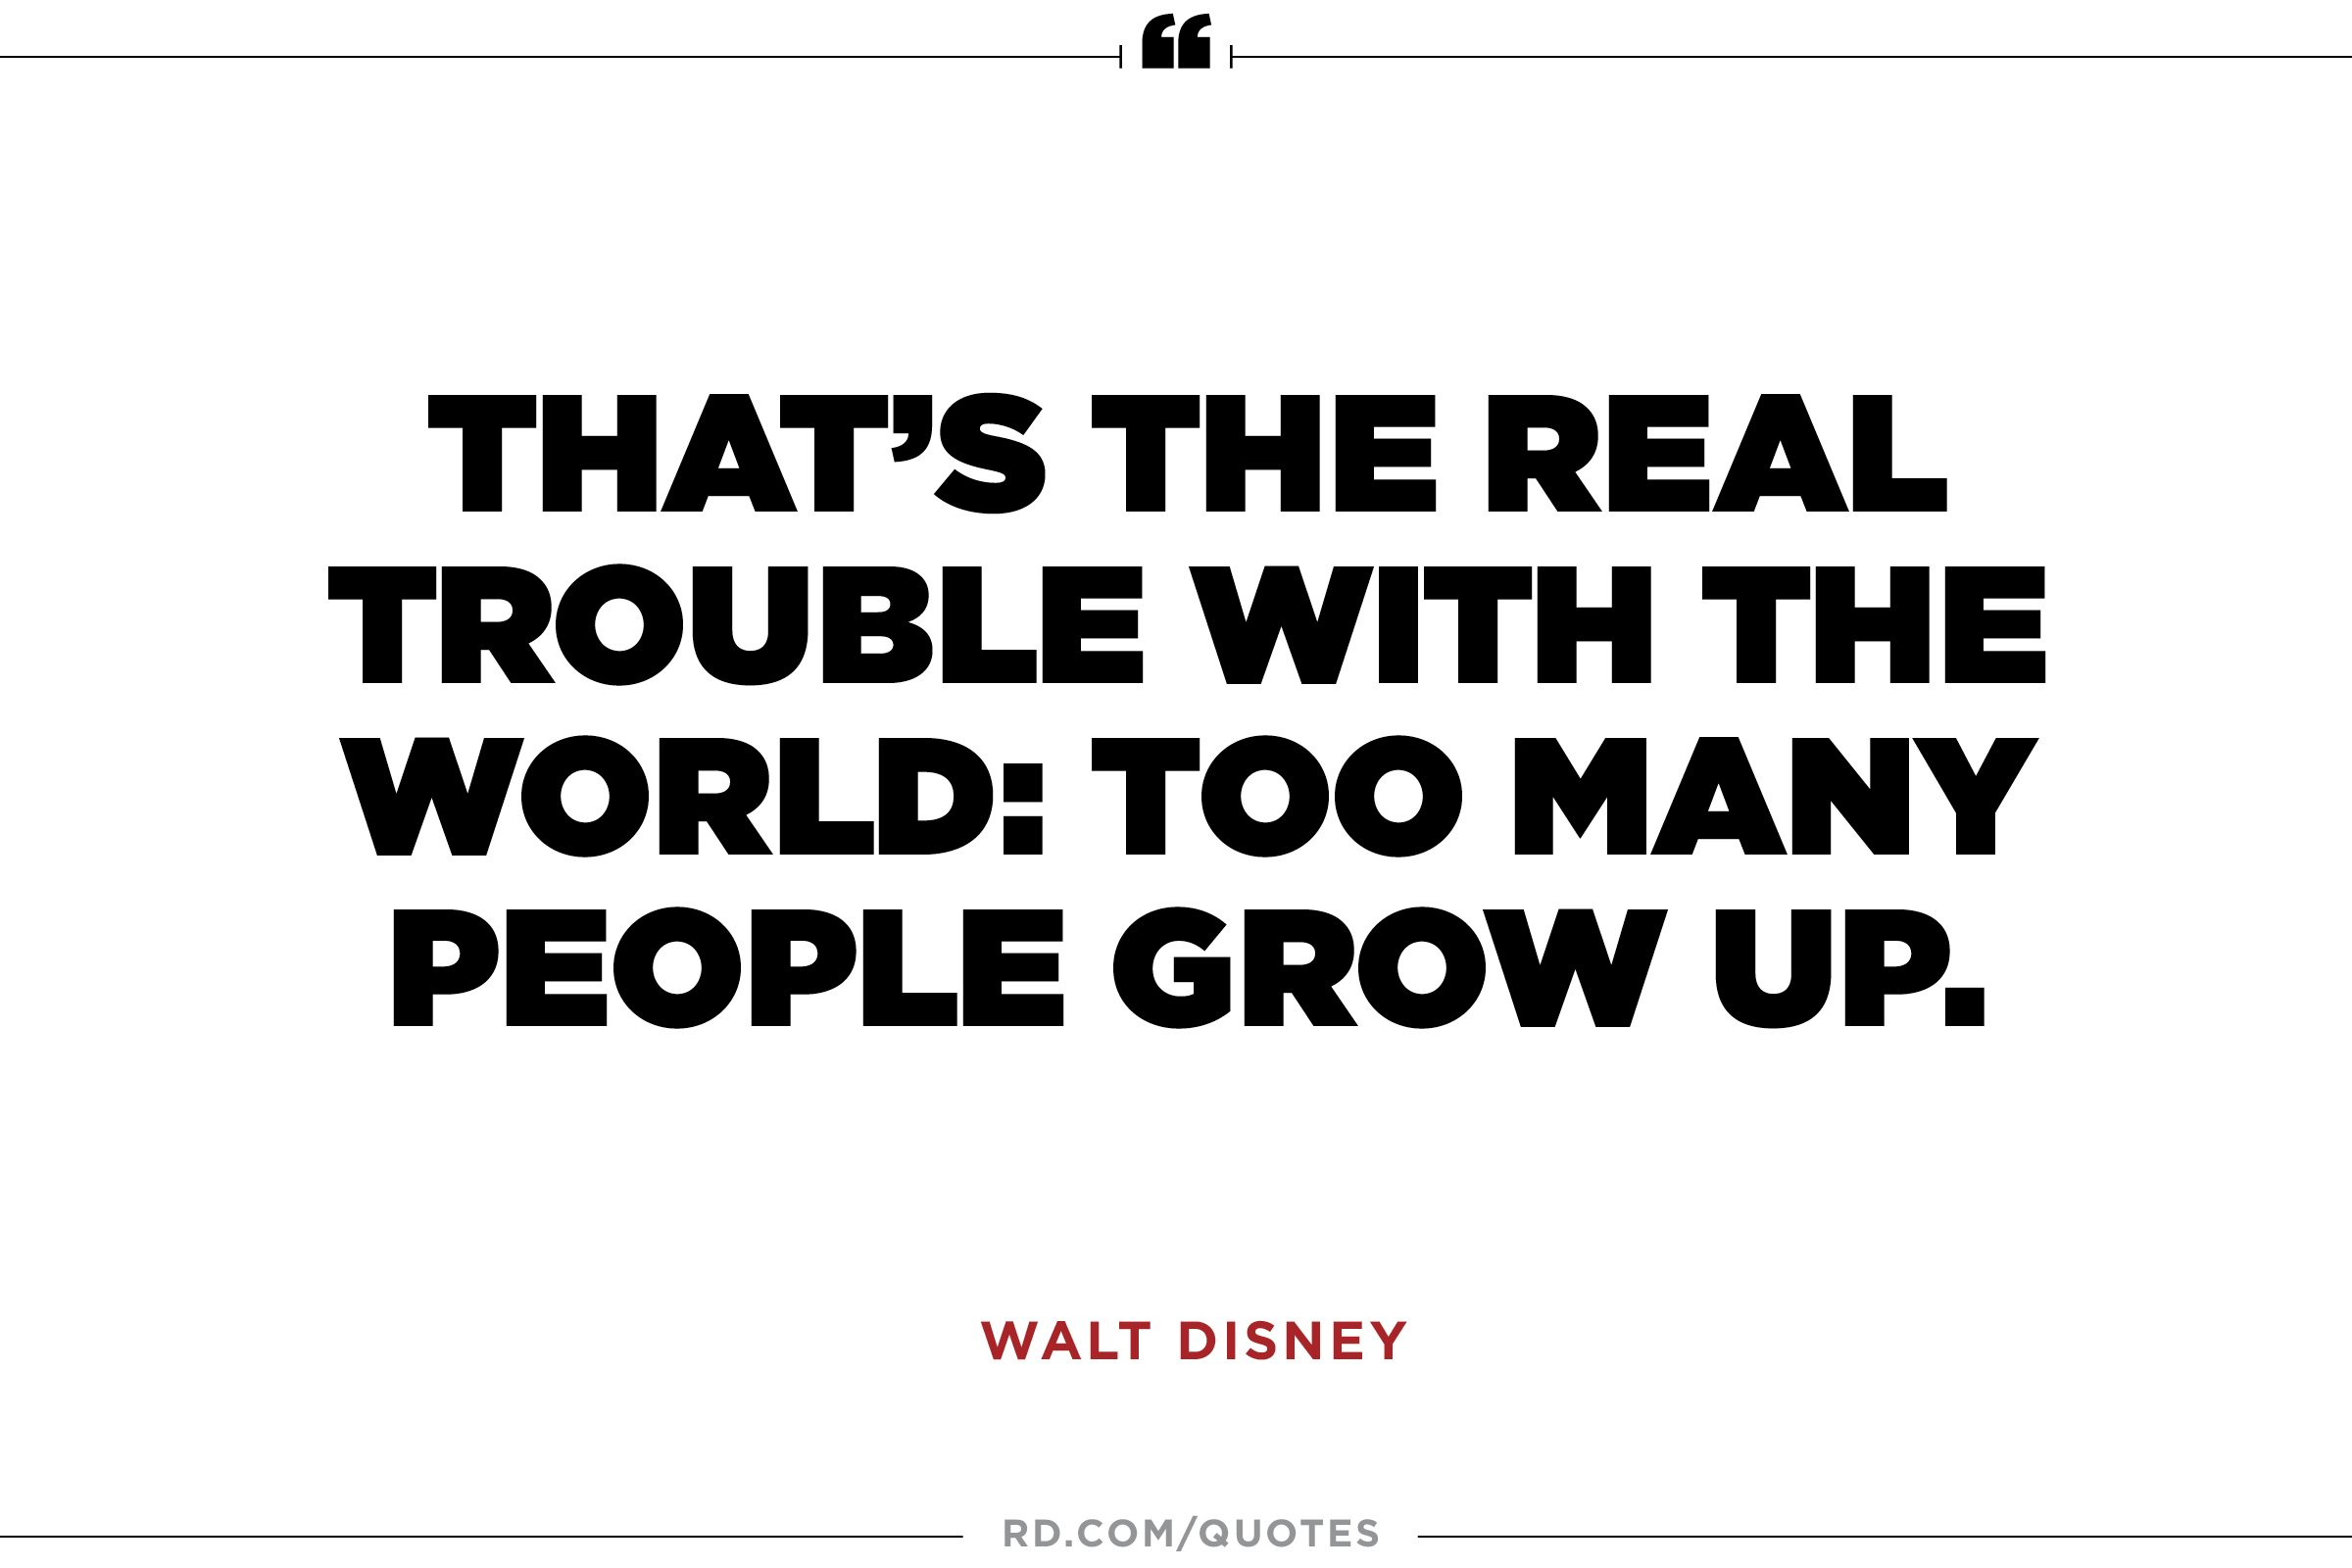 Walt Disney Quotes About Life 11 Inspiring Walt Disney Quotes  Reader's Digest